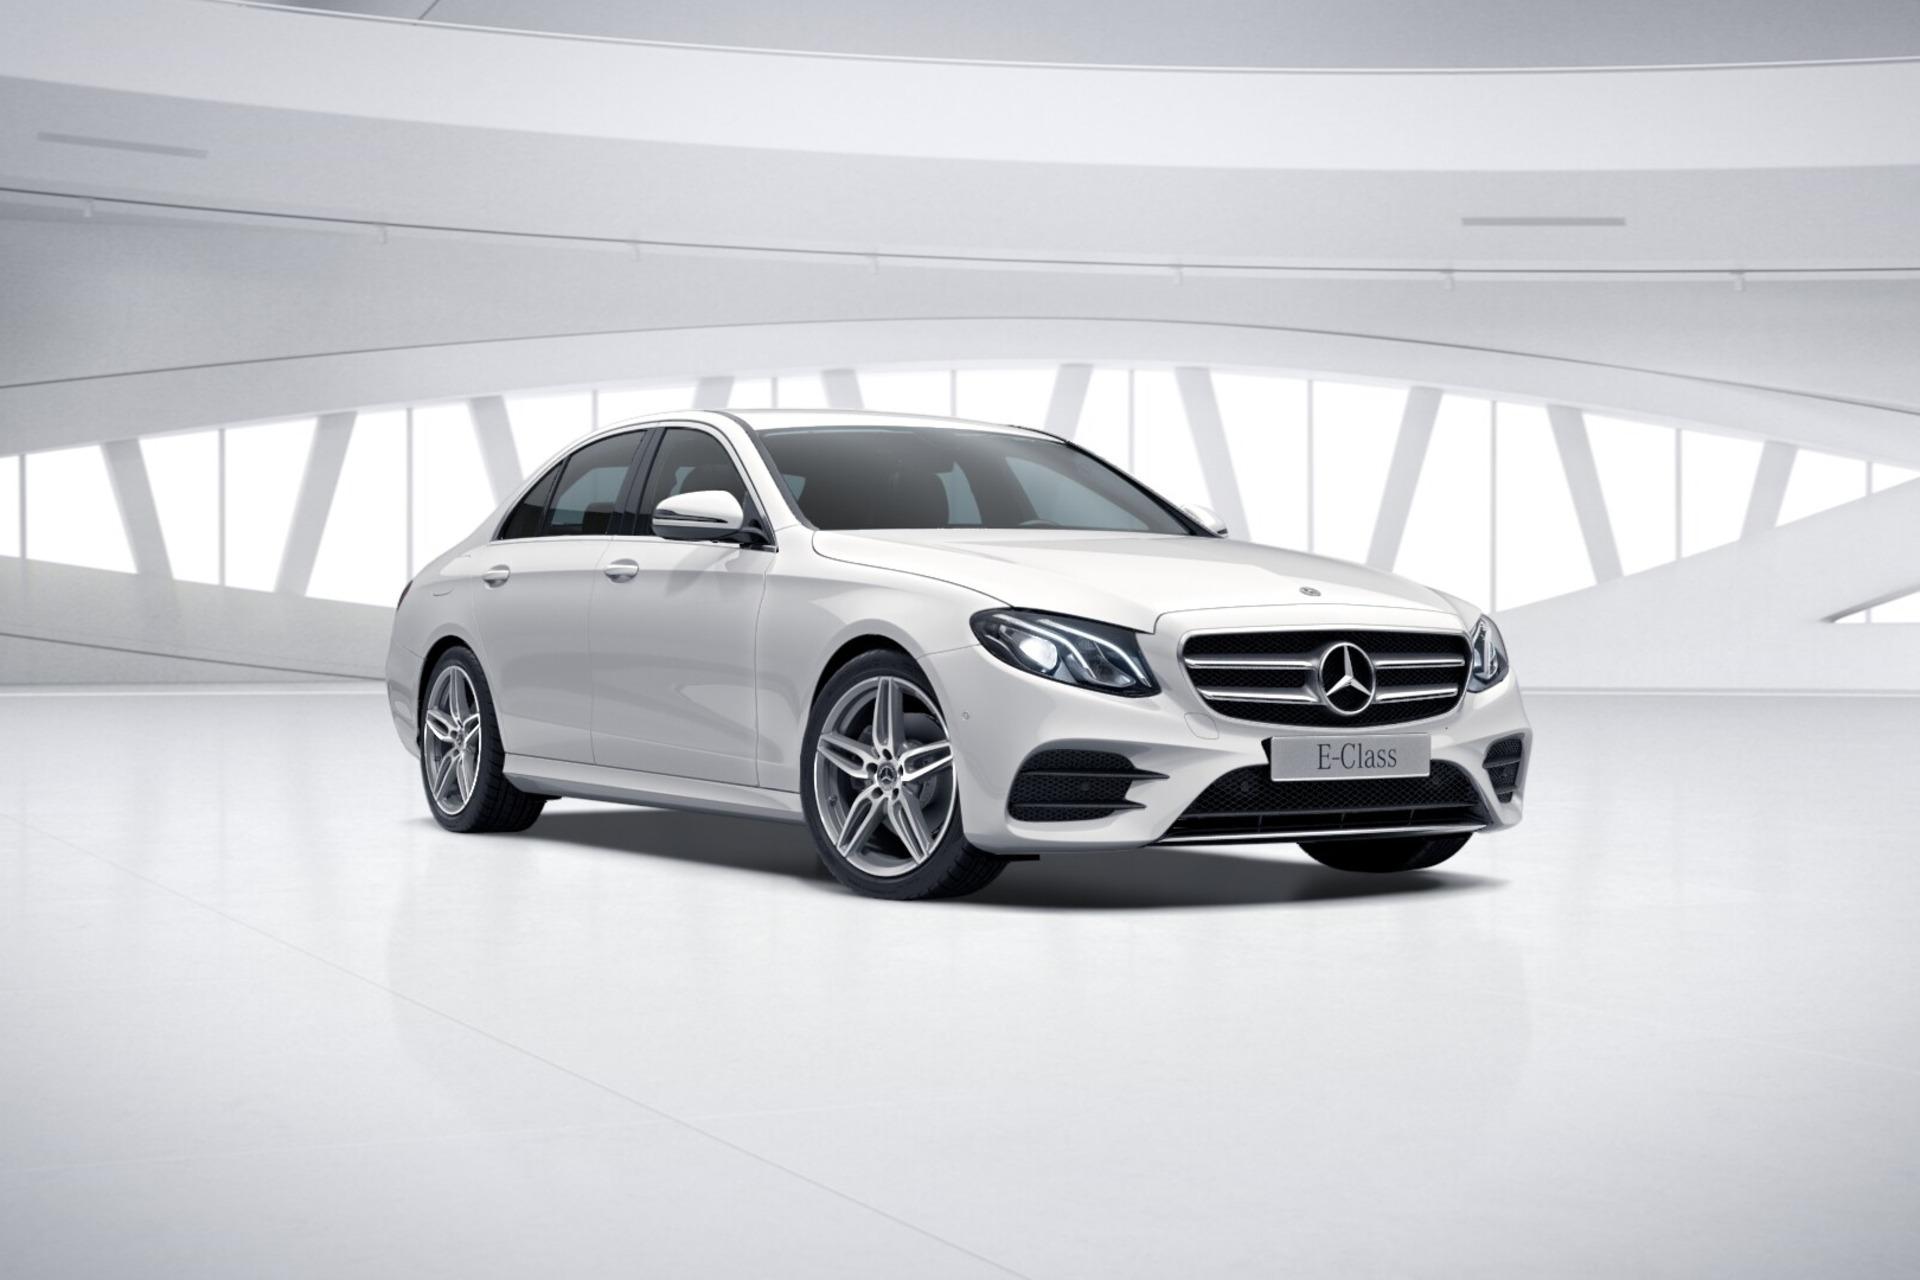 Mercedes-Benz E-Class Limousine 952611393